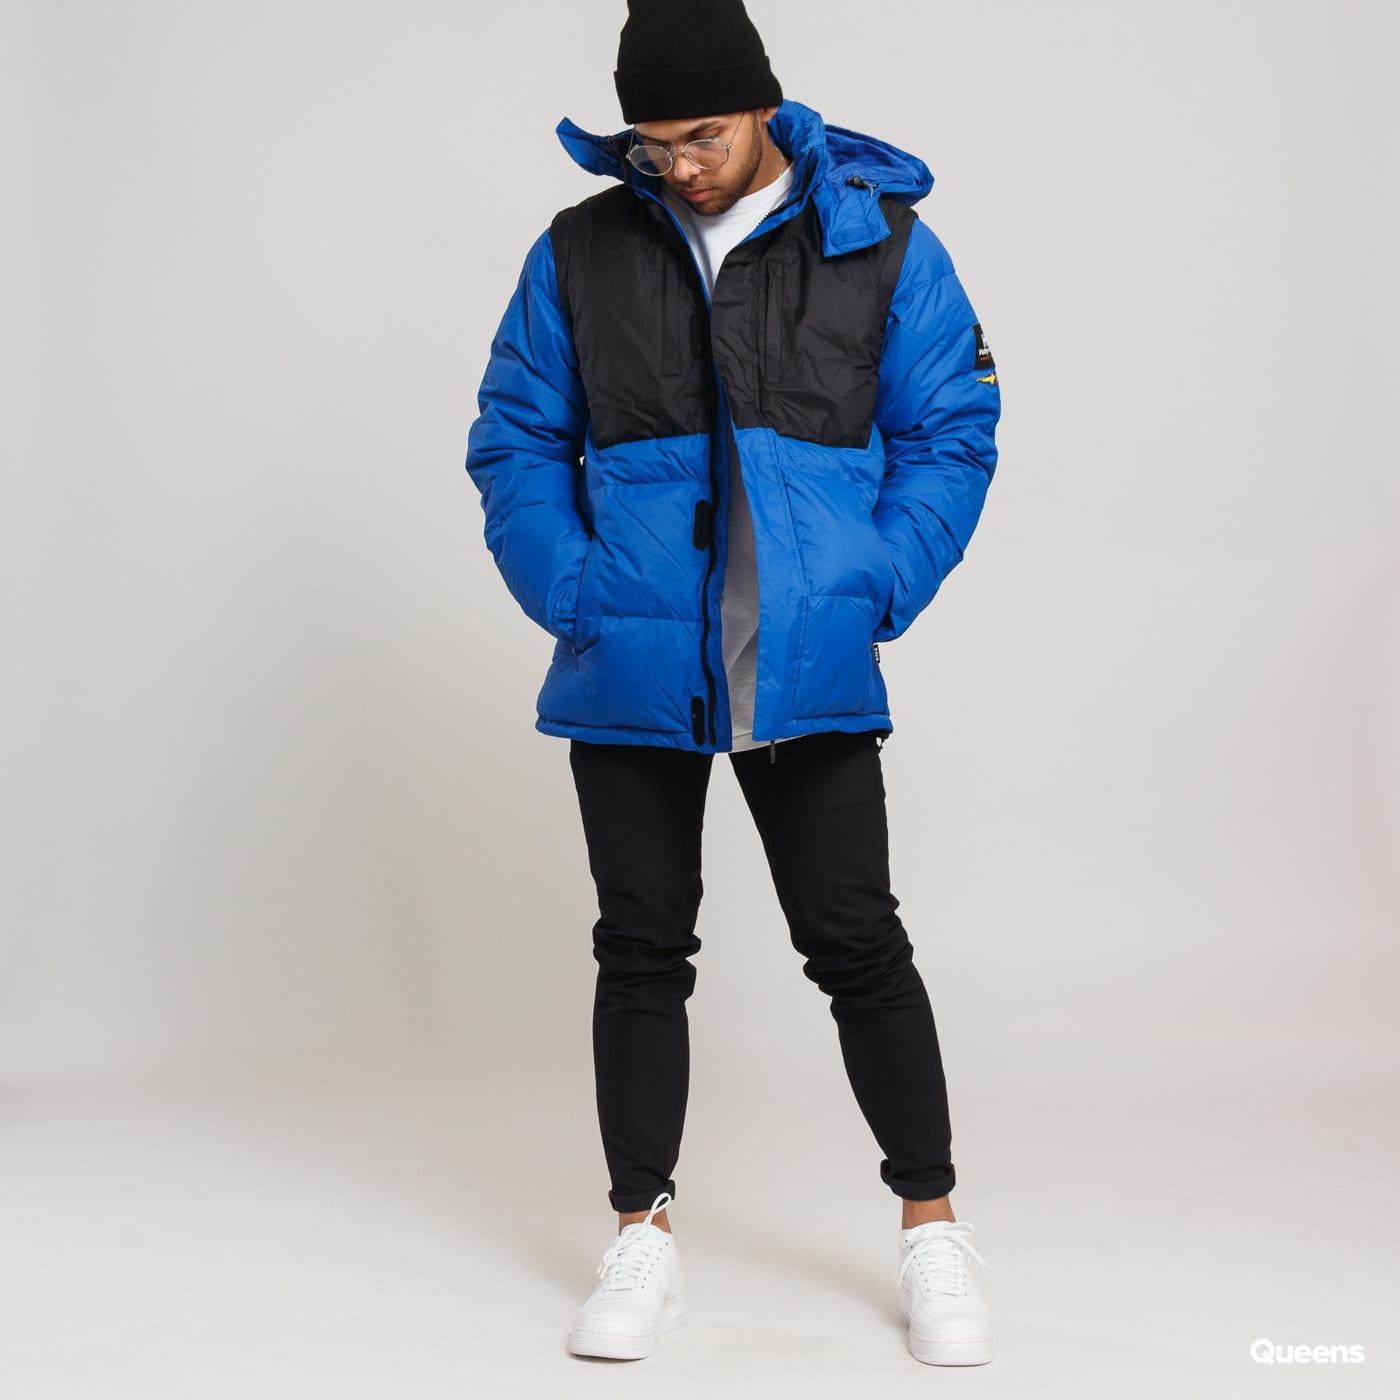 Pánská zimní bunda Helly Hansen Sweet HH Two In One Jacket – Queens 💚 809c95fe33